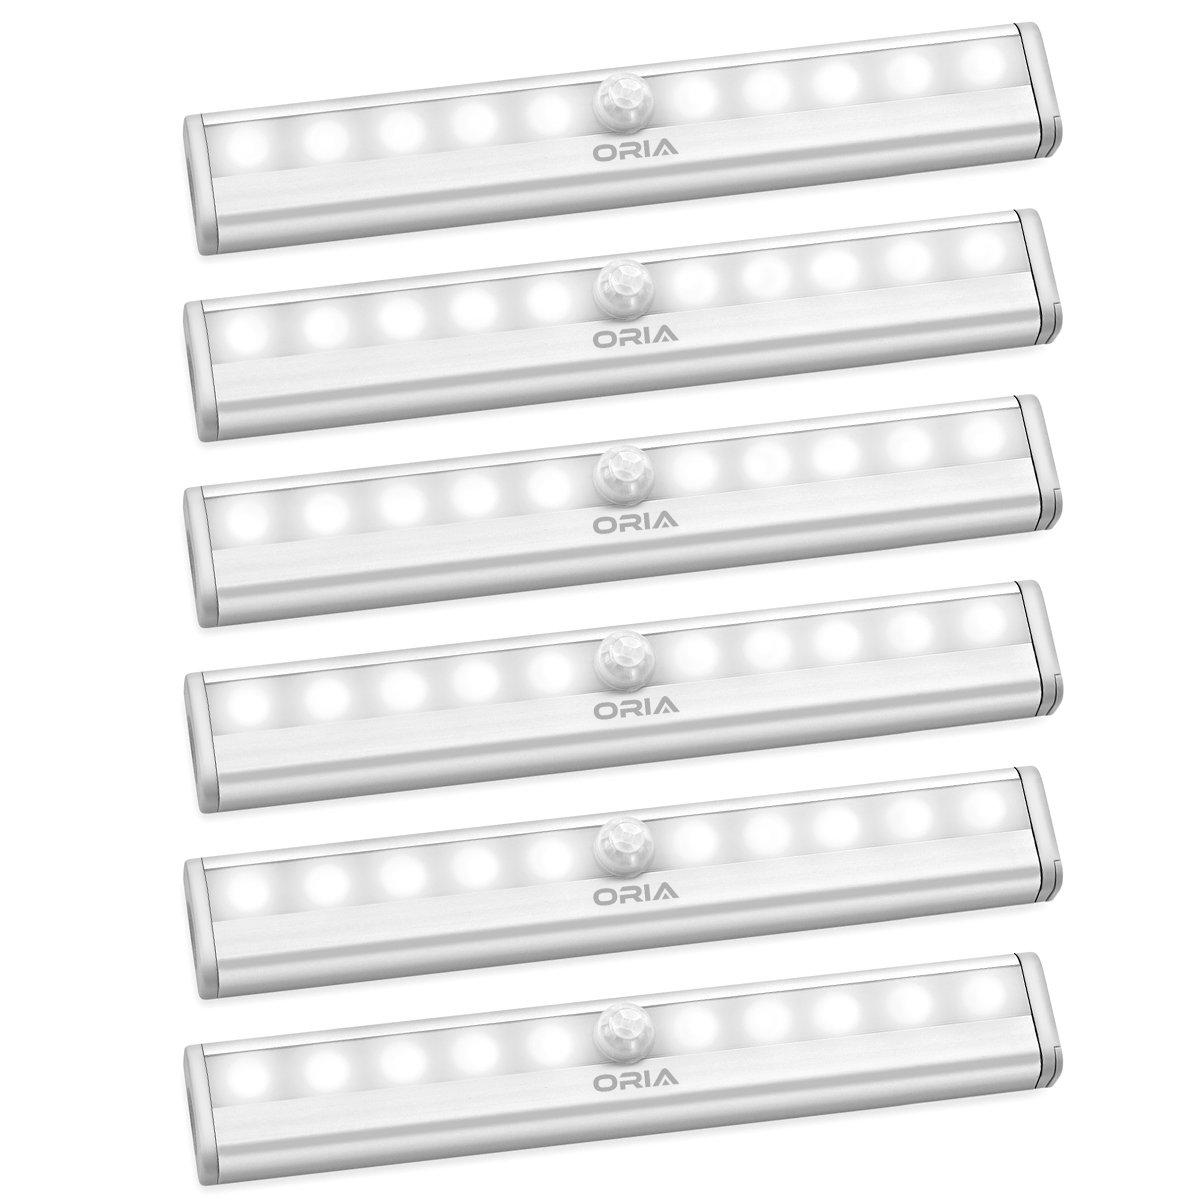 Oria Motion Sensor Light Bar (20 LED), 3 Pack Wardrobe Light, LED Closet Night Light with Stick-on Magnetic Strip, 3 Light Modes, USB Charging, for closet, Stairs, Kitchen, Stair, Washroom etc.